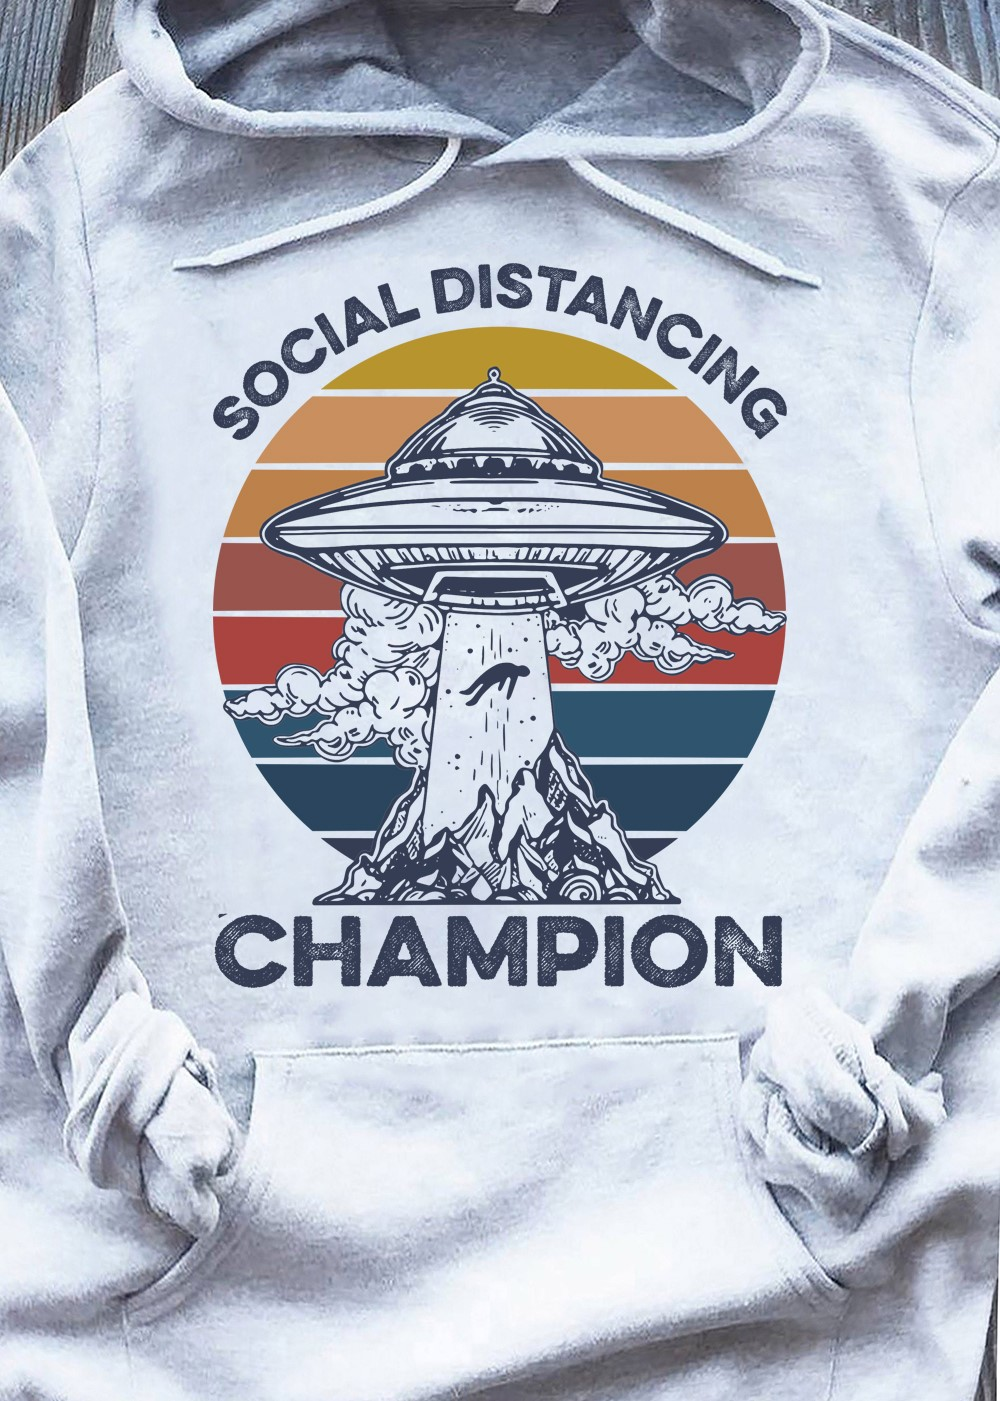 UFO Shirt Social Distancing Champion